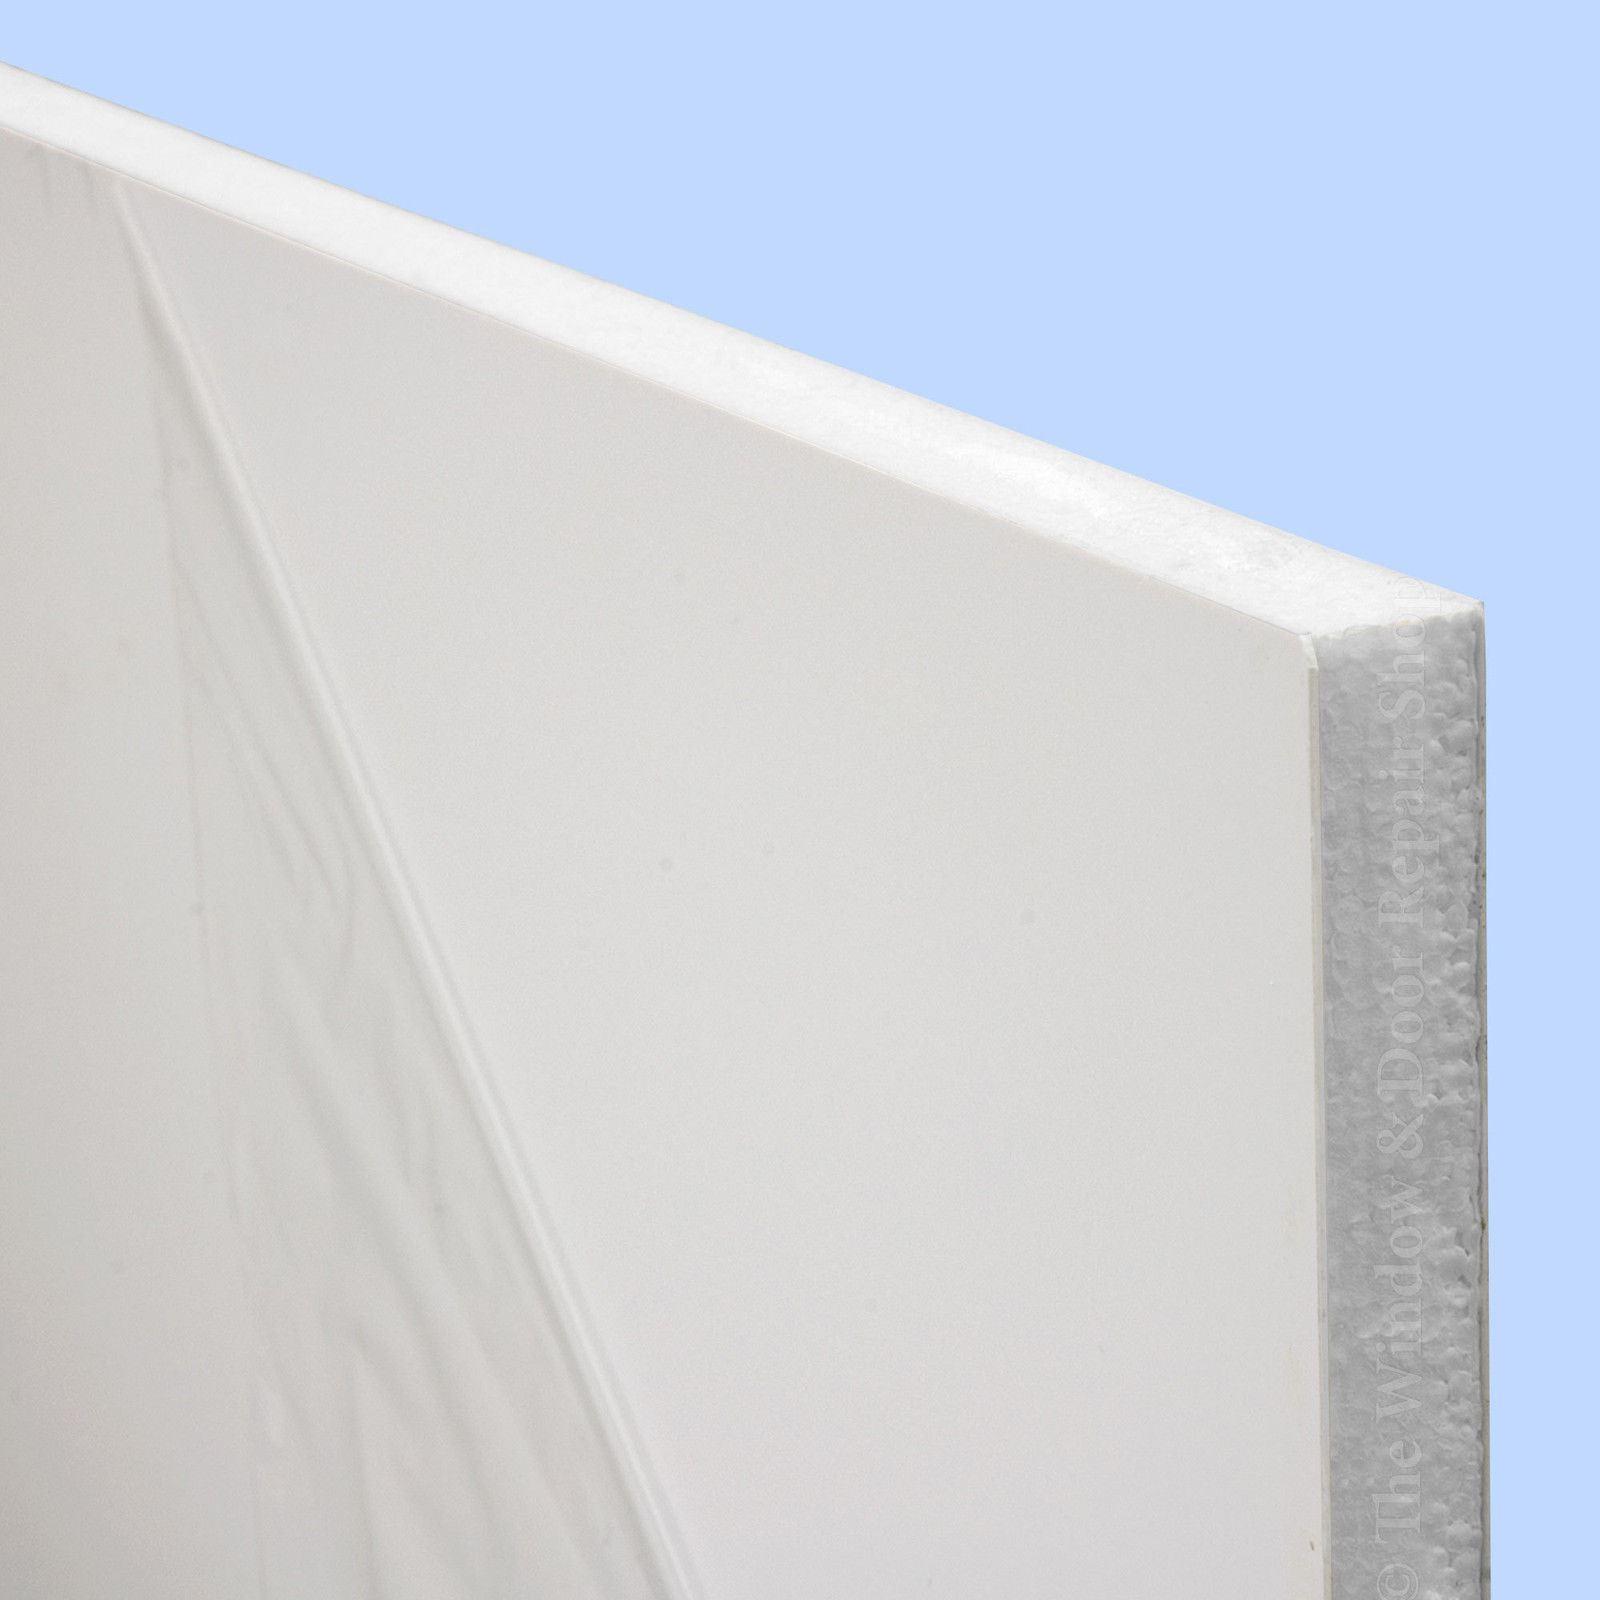 White Upvc Flat Door Panel 20mm 24mm 28mm Thick Plastic